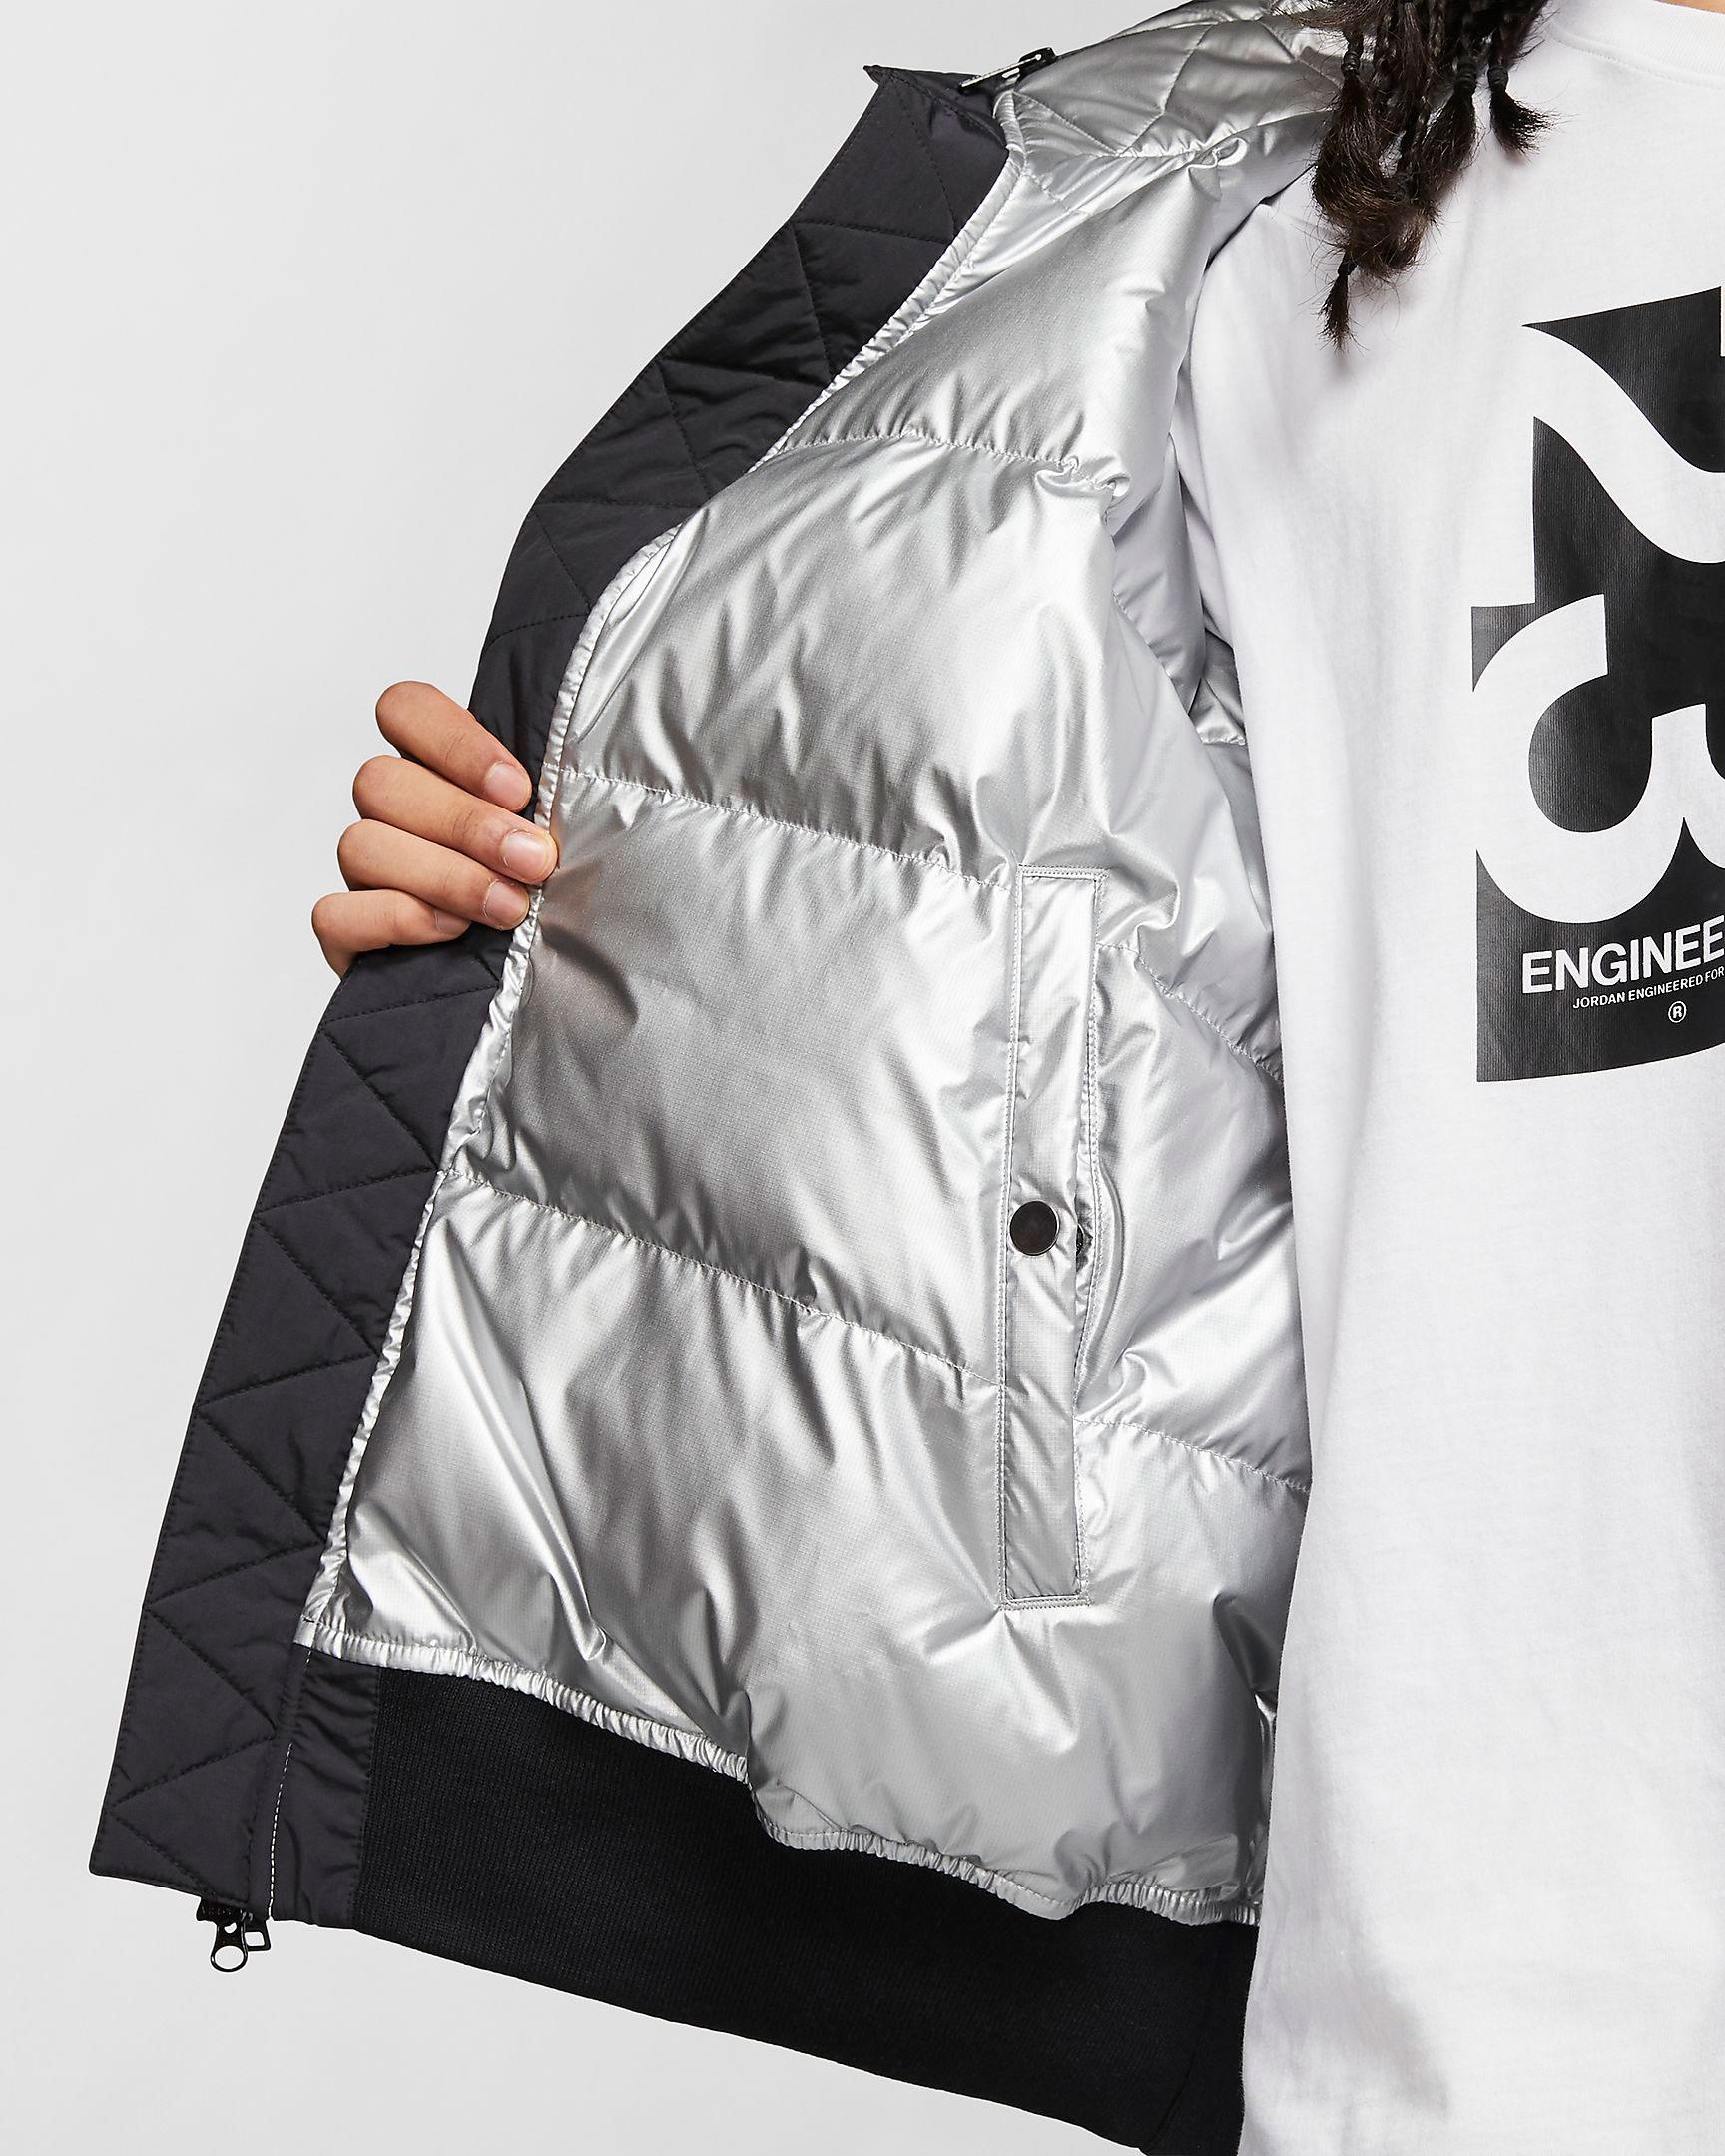 jordan-23-engineered-ma1-down-jacket-black-silver-6